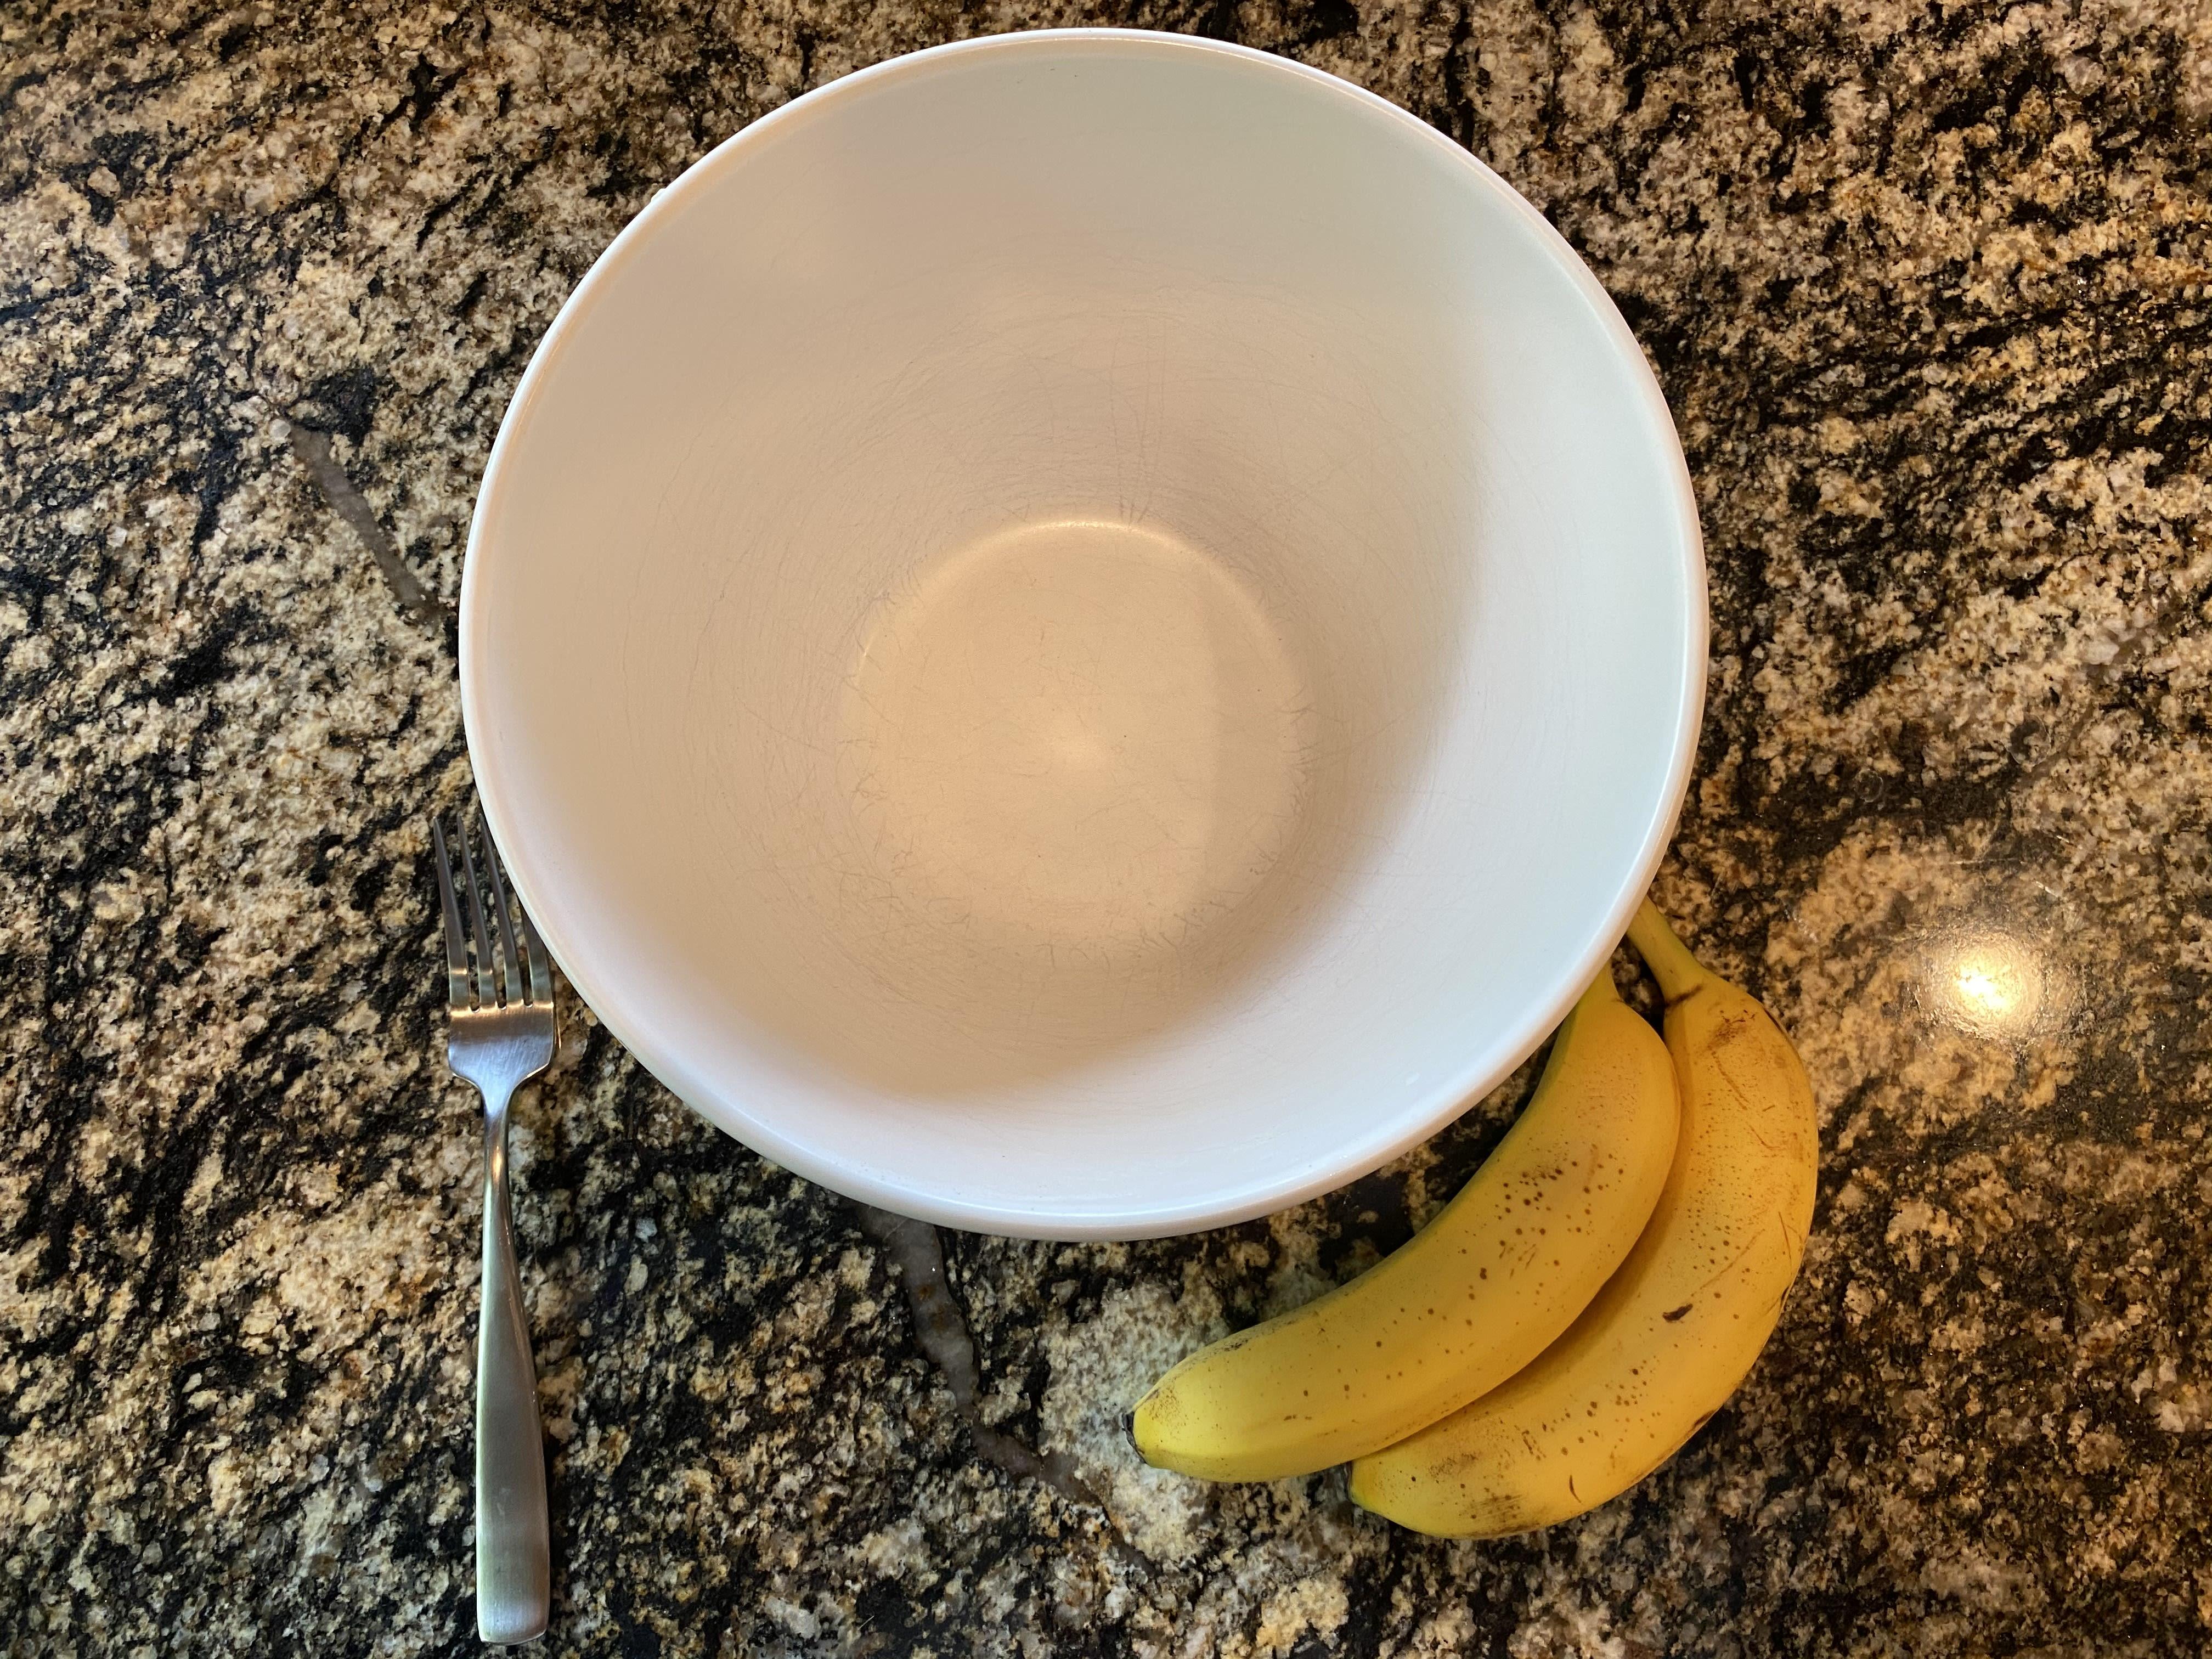 Mash the Bananas